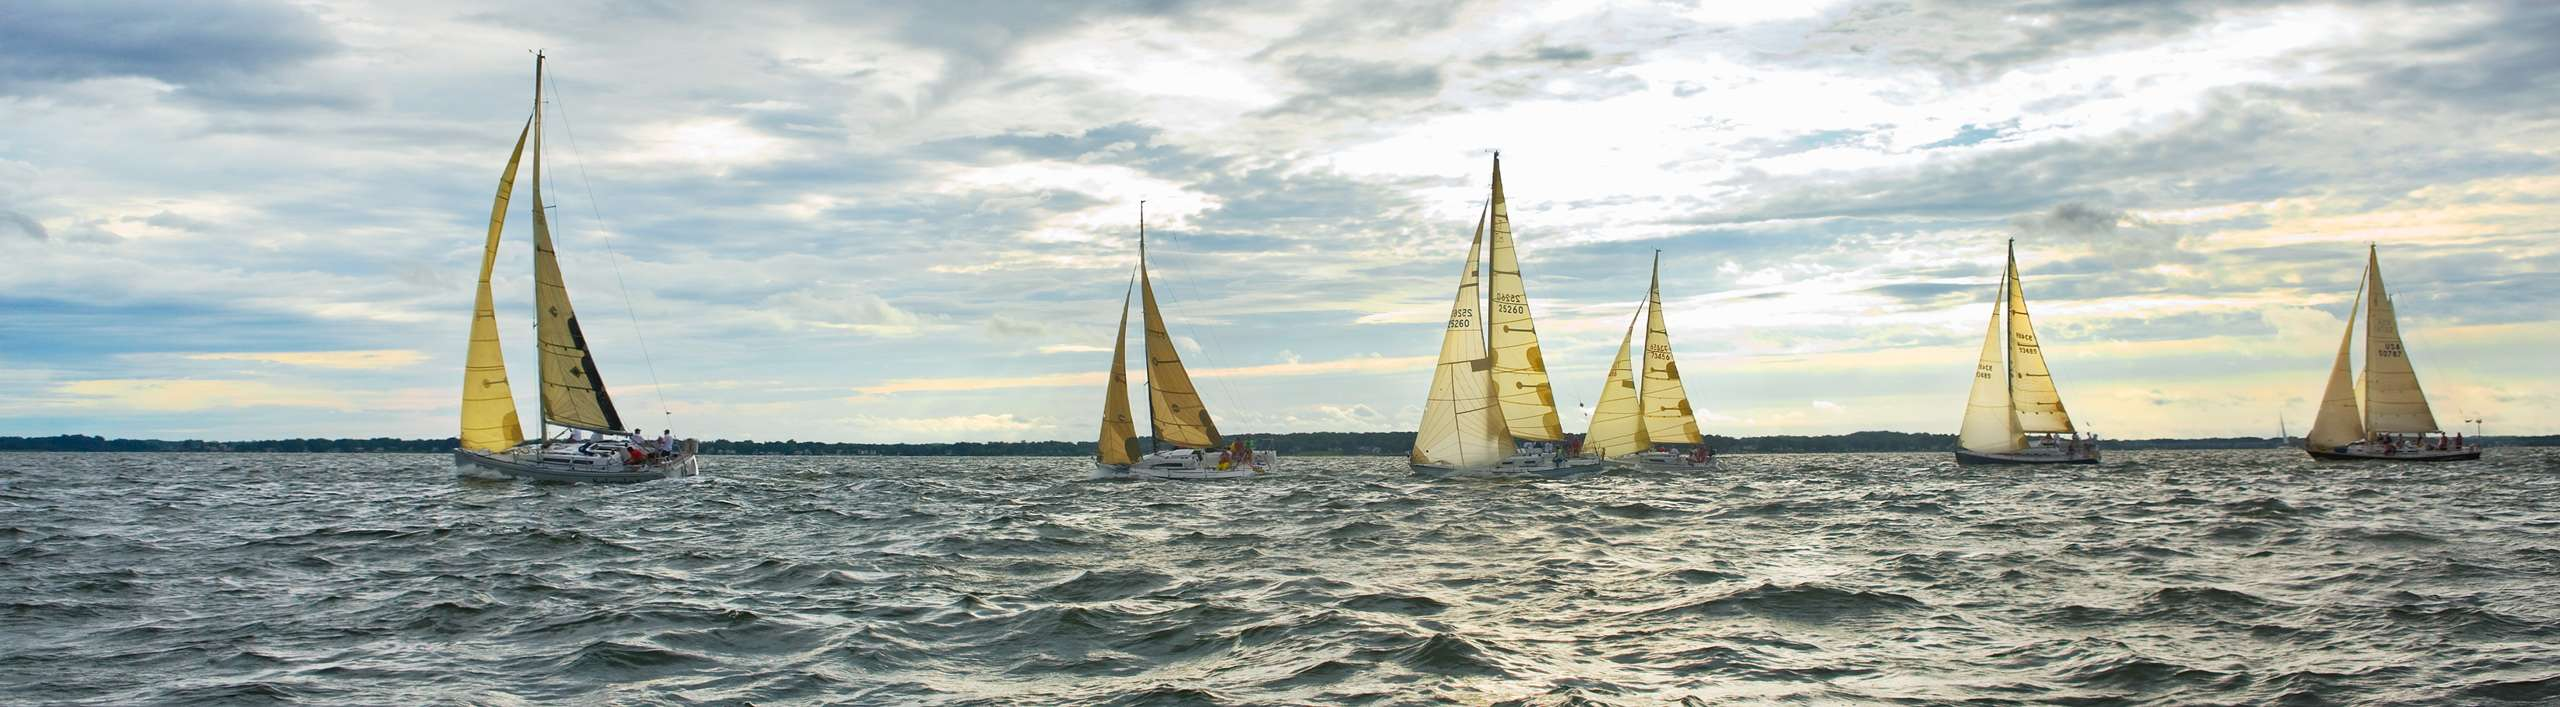 PORTFOLIO - Sailing - Chesapeake #24    PCG 427